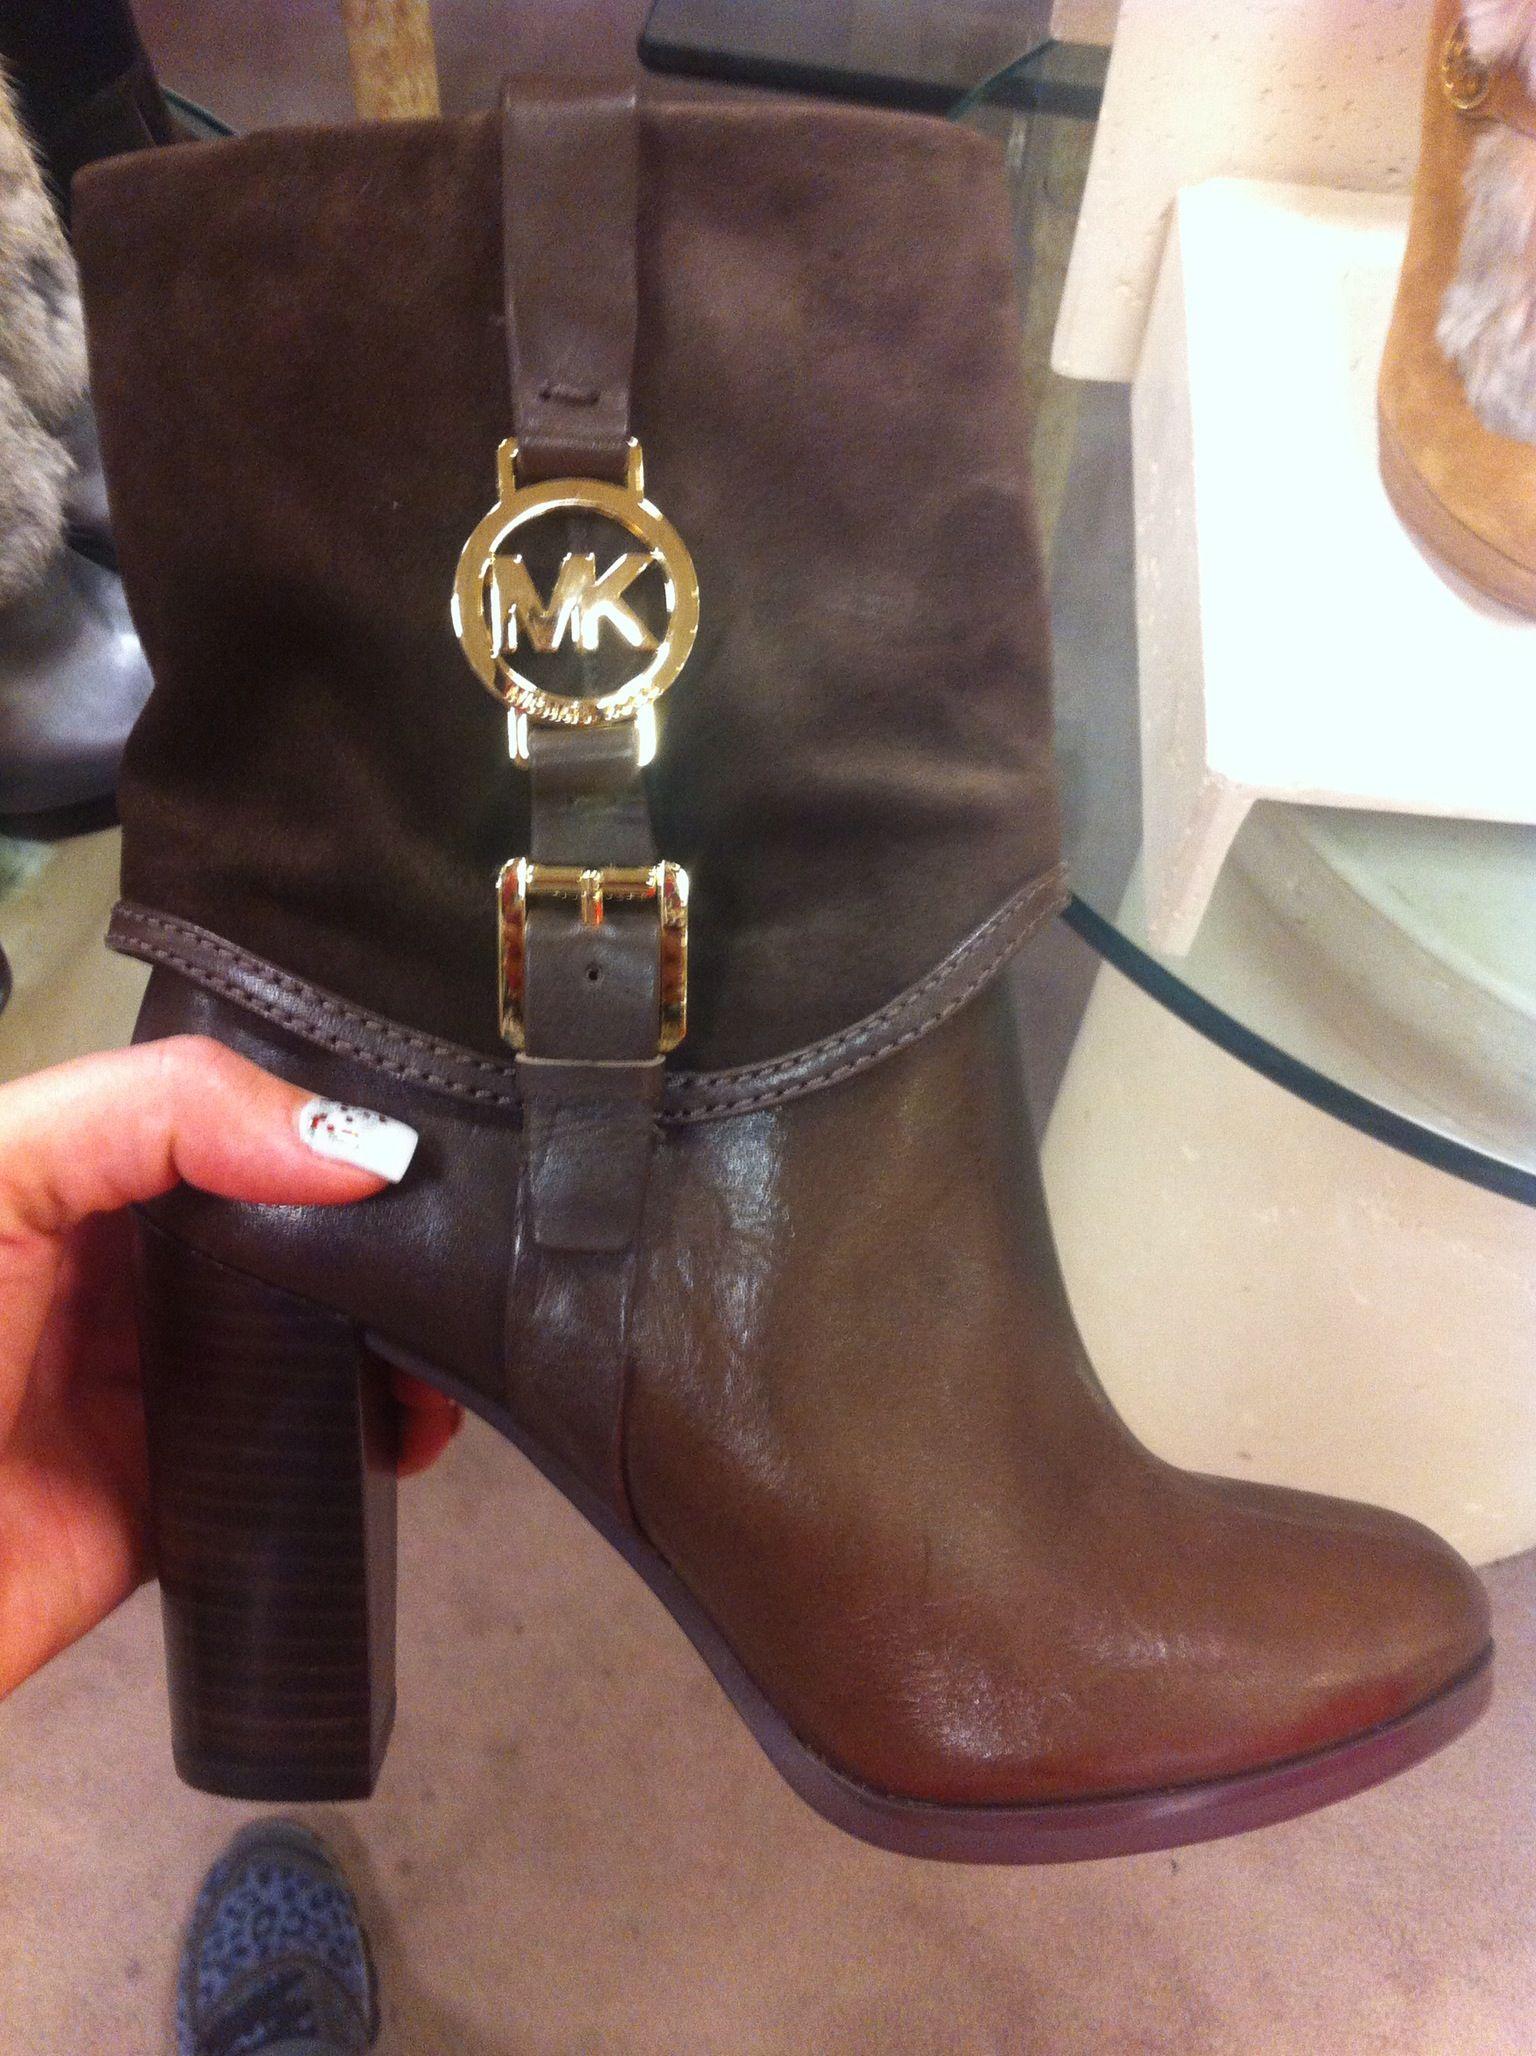 Michael kors boots! Macy's or Dillard's?